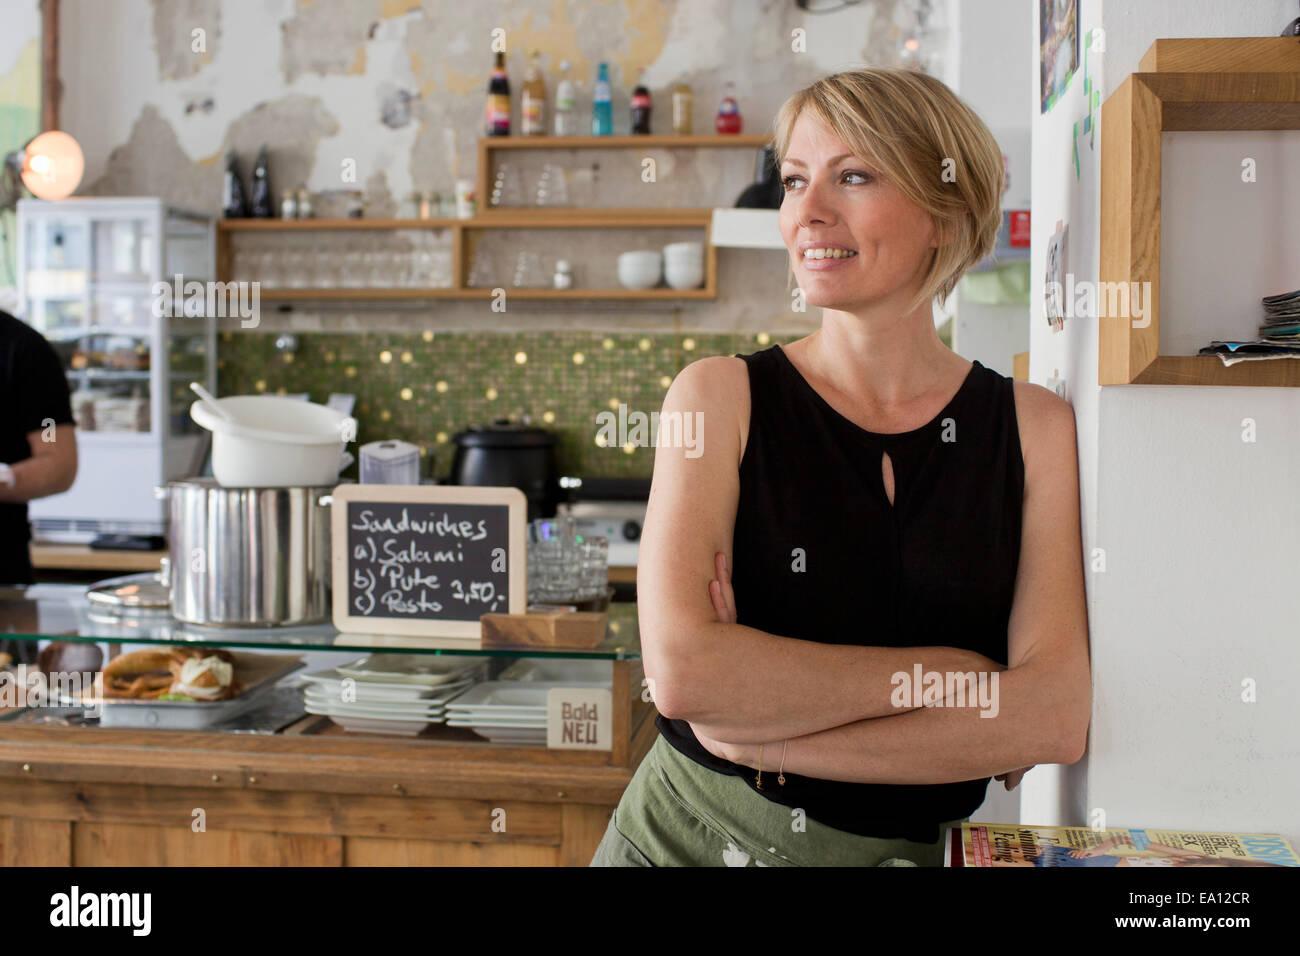 Mitad mujer adulta en cafe Imagen De Stock